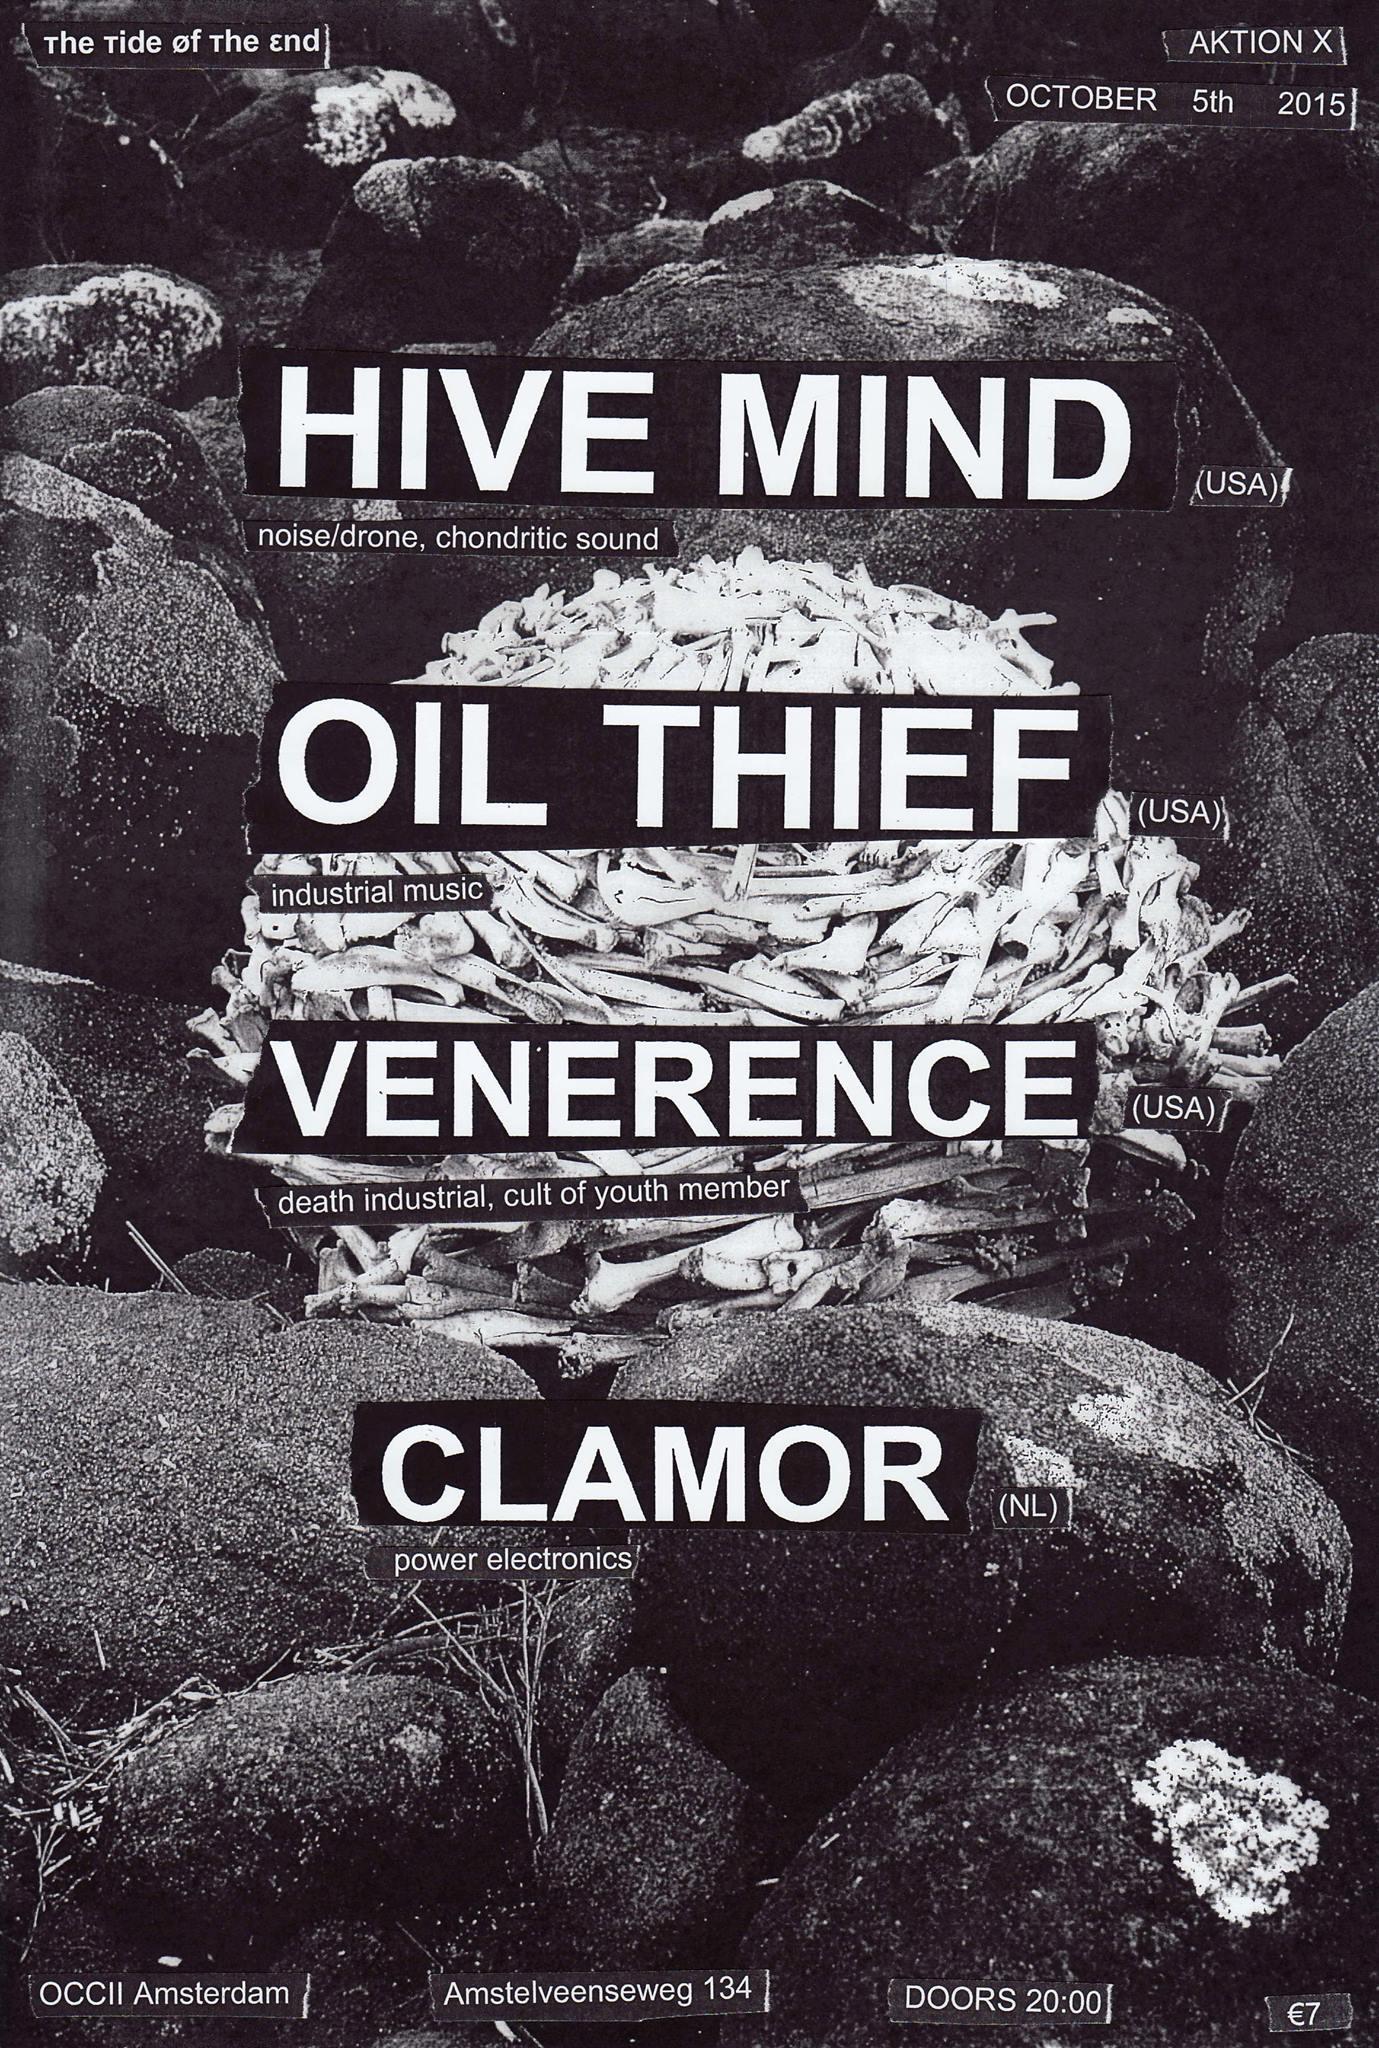 [ттøтε] AKTION X -w/ HIVE MIND (us) + OIL THIEF (us) + VENERENCE (us) + CLAMOR